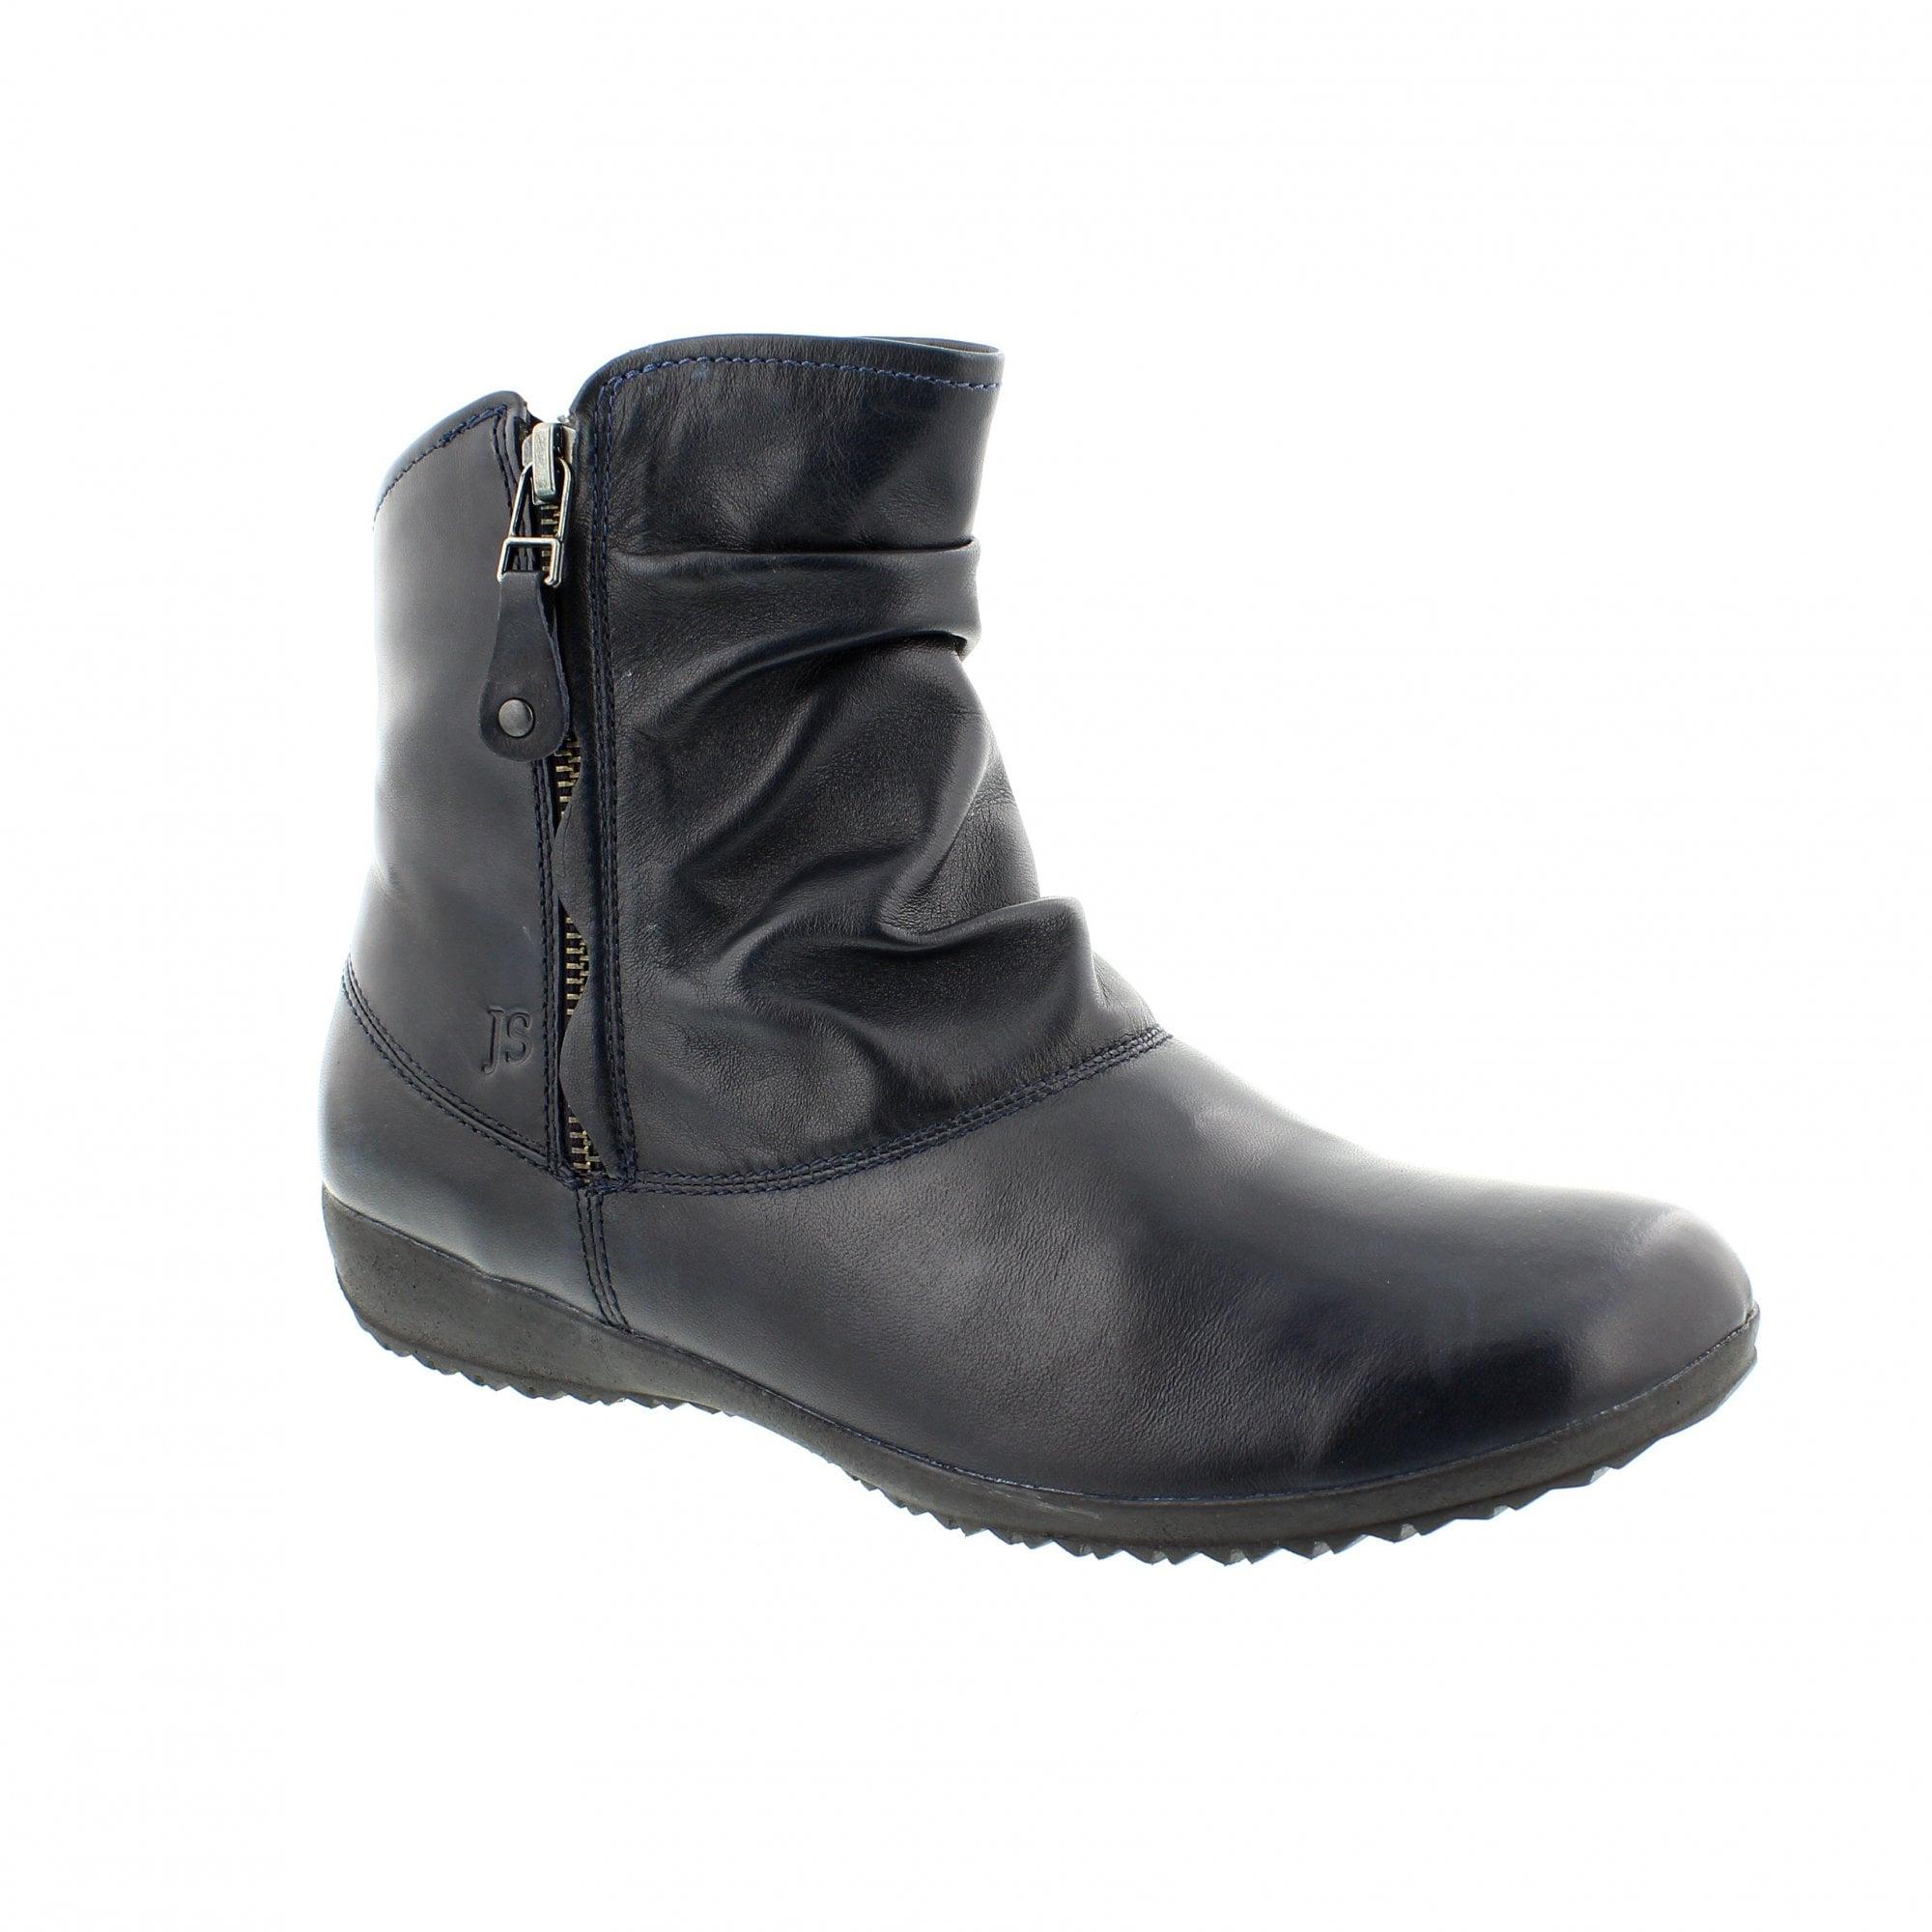 2e44f800b599 Josef Seibel 79724-VL971530 Womens Ankle Boots